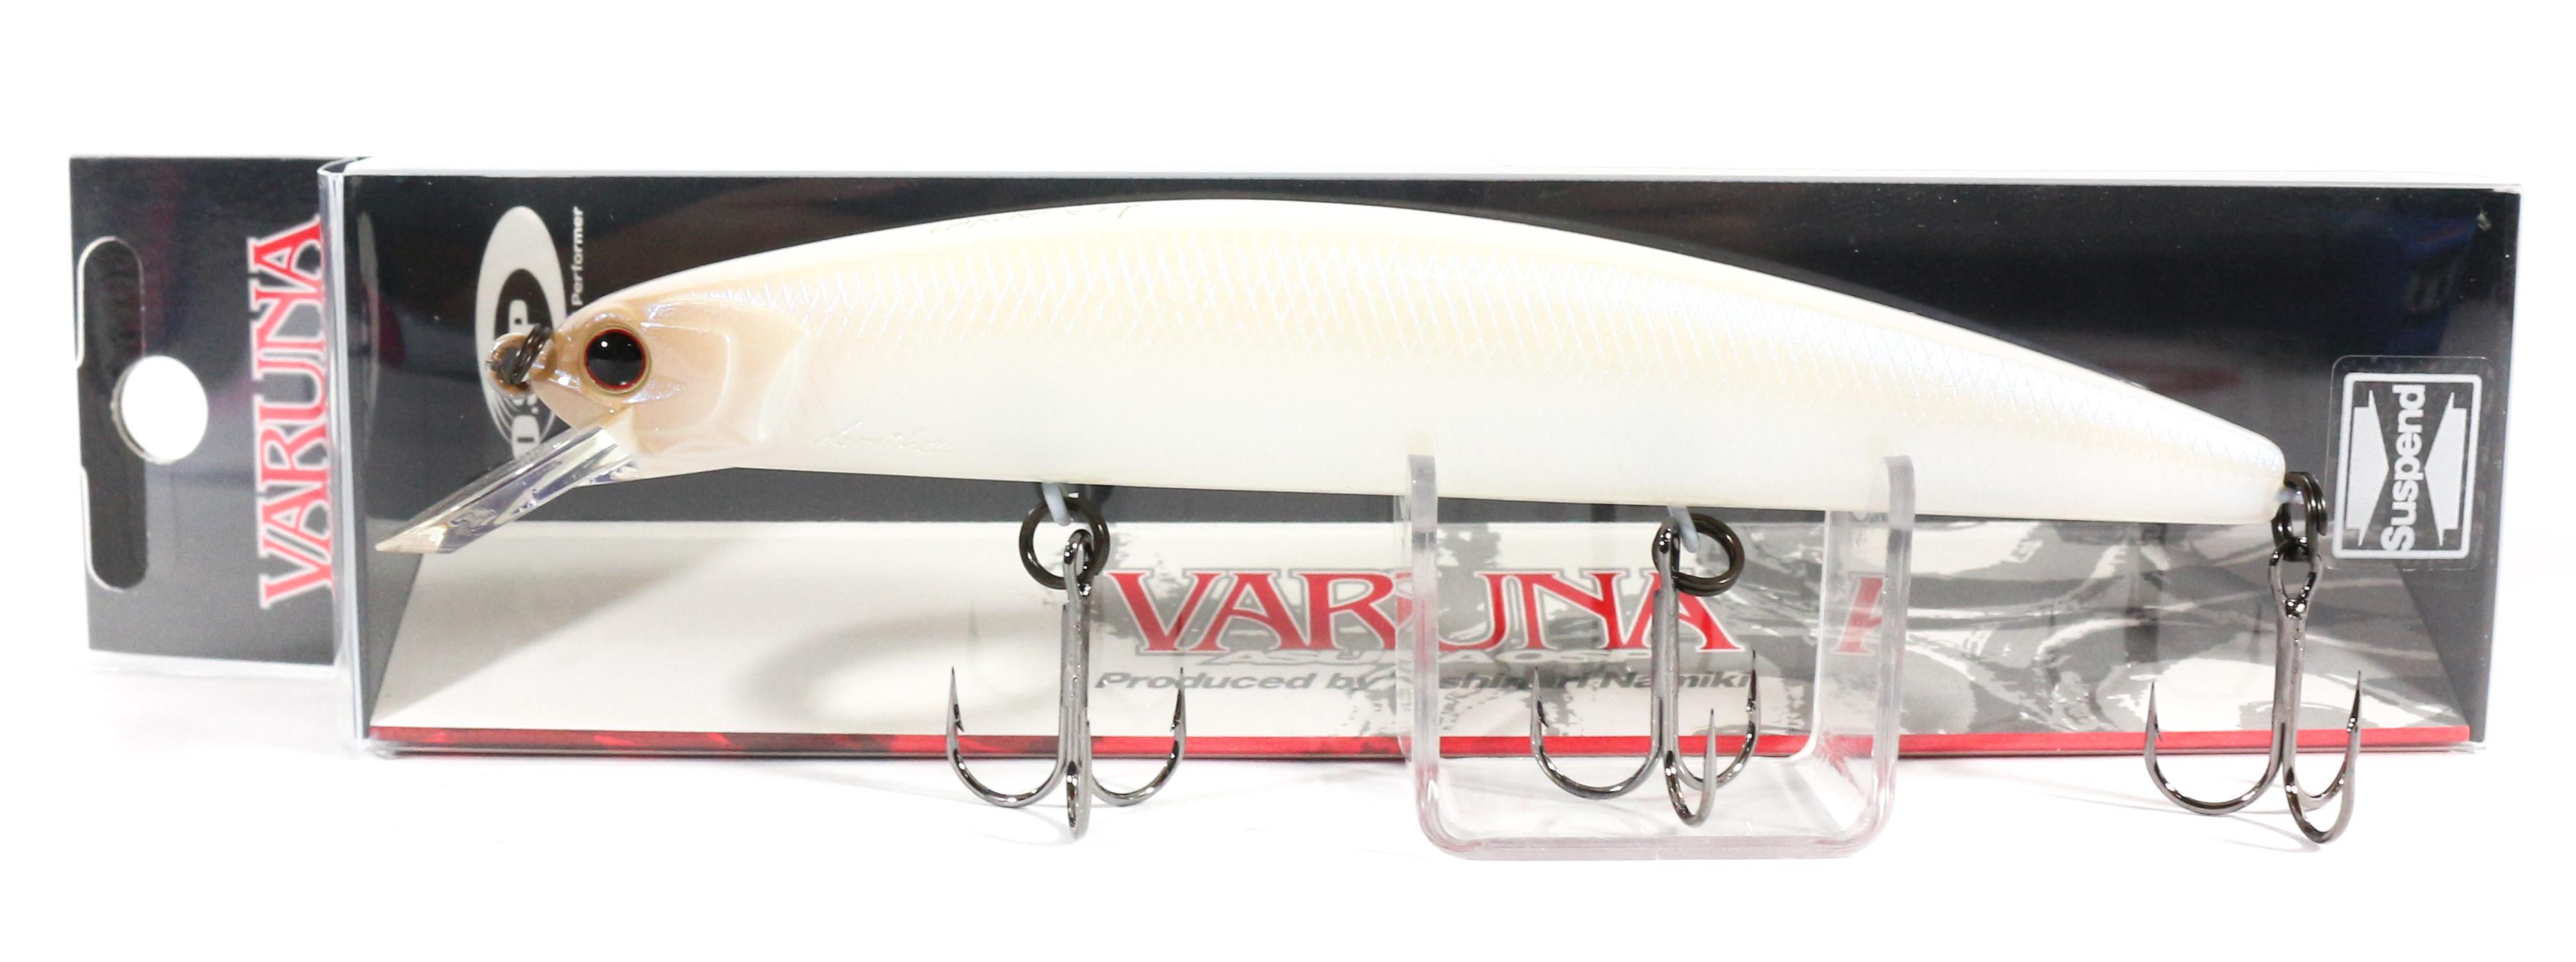 OSP Varuna 110 S Sinking Minnow Lure P-64 6098